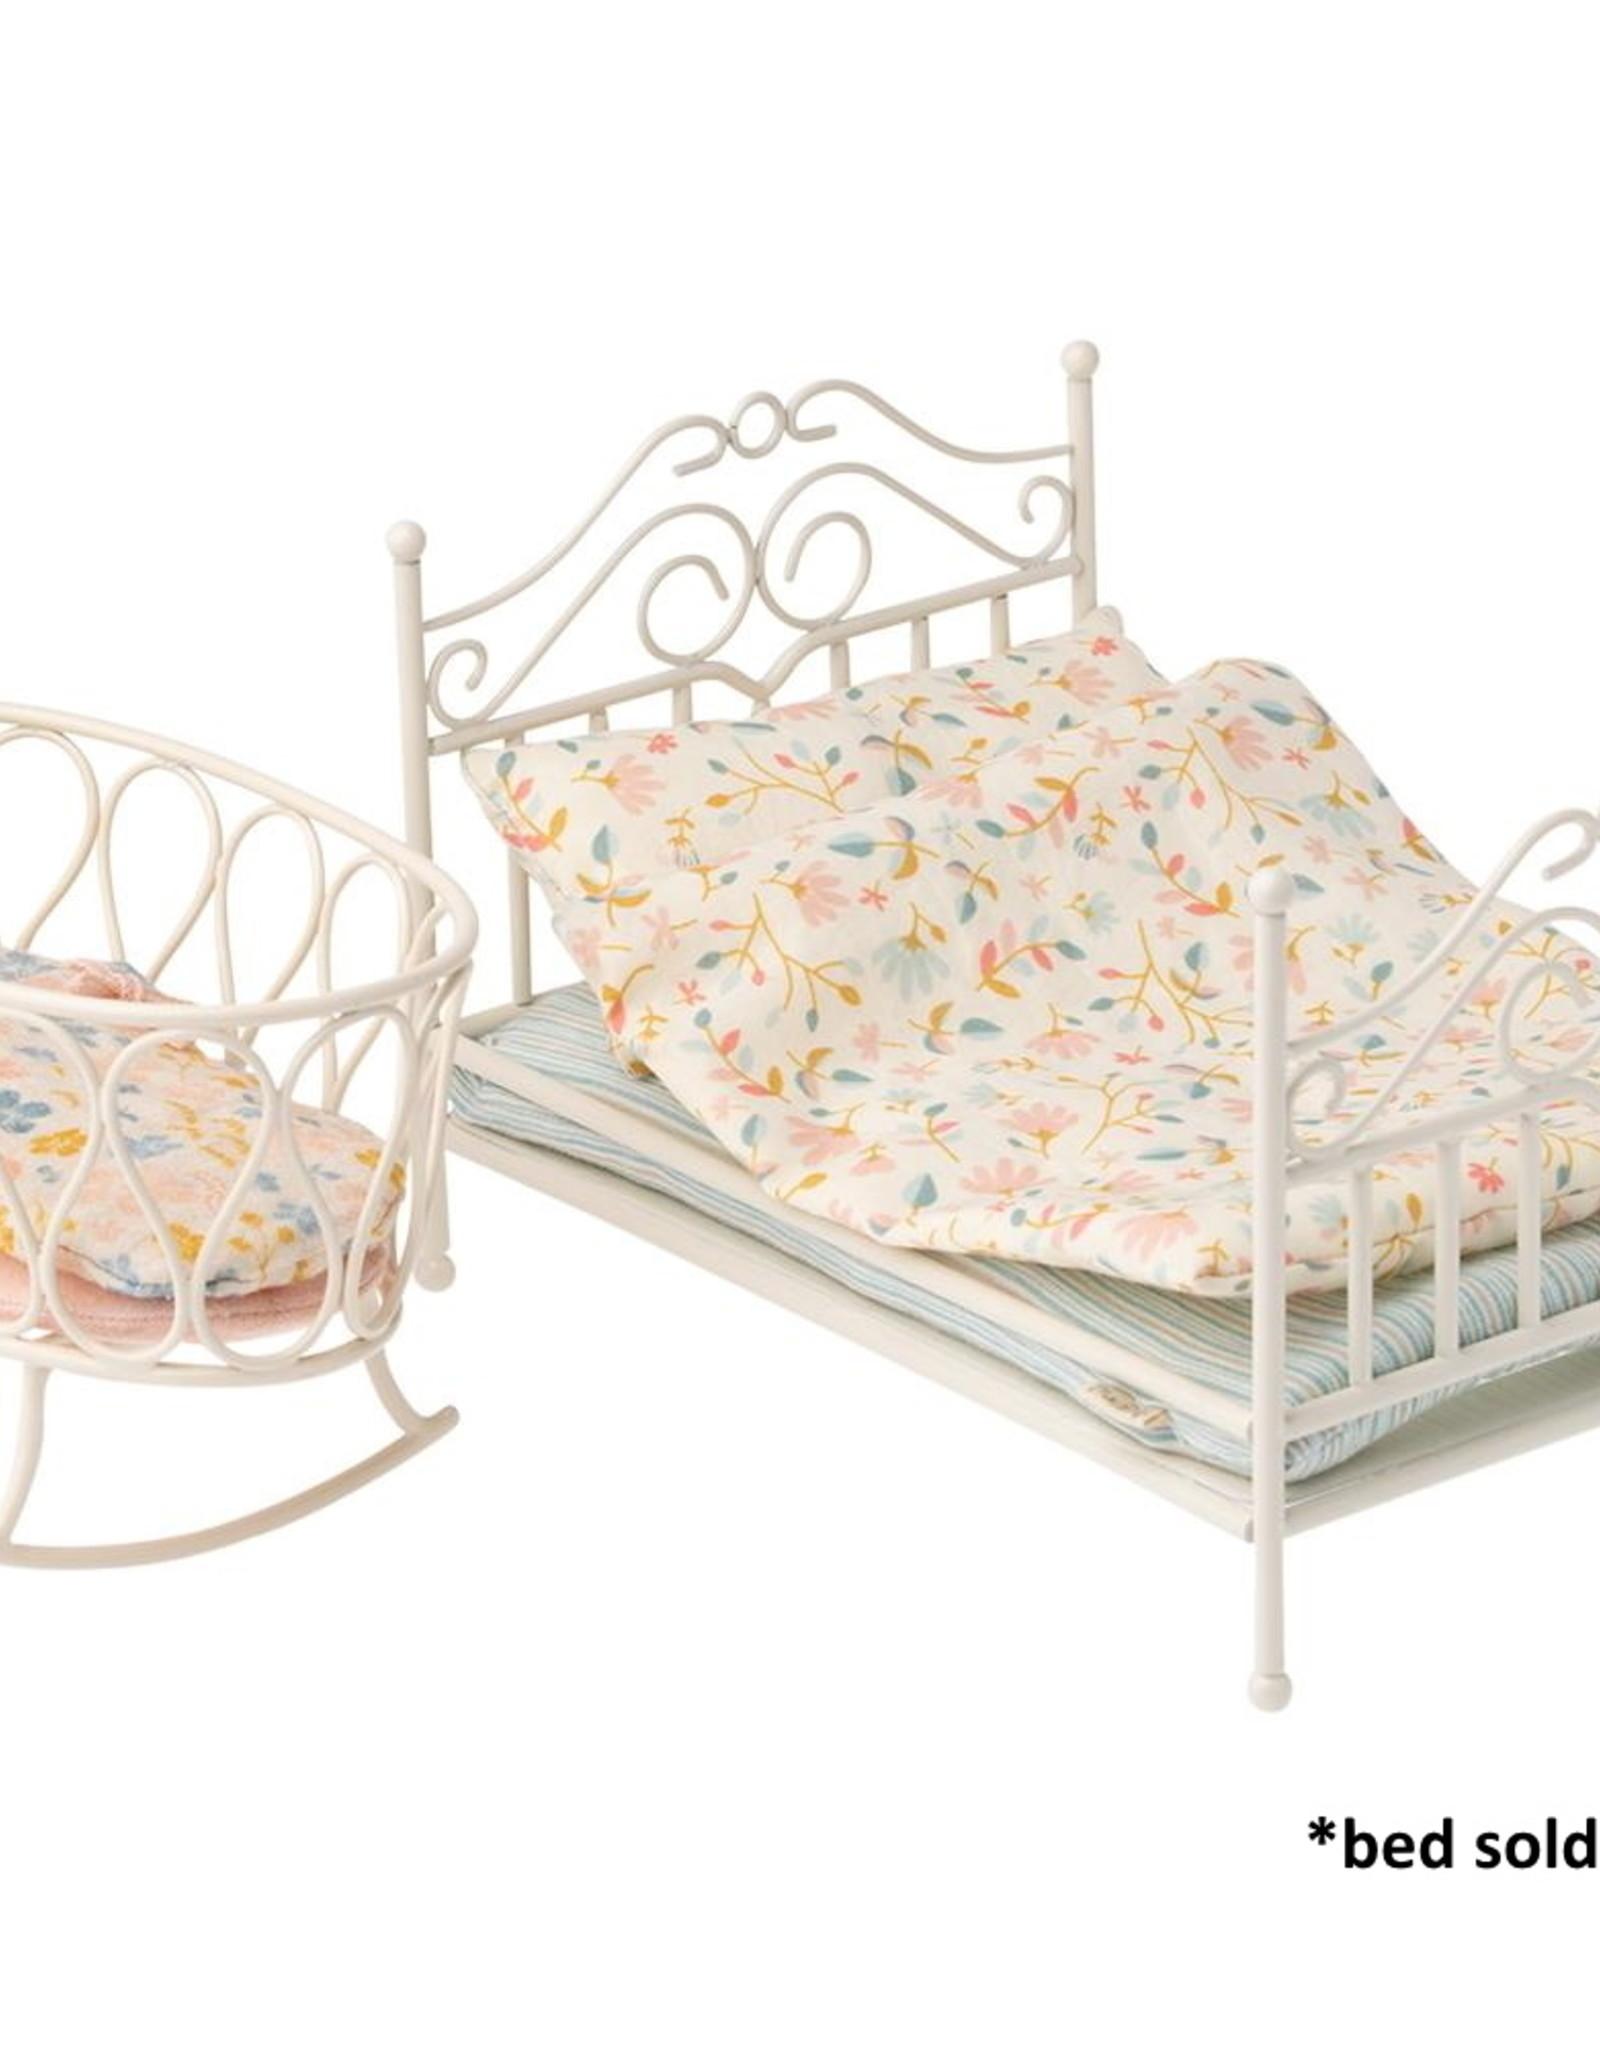 Maileg Maileg - Cradle With Sleeping Bag Micro White